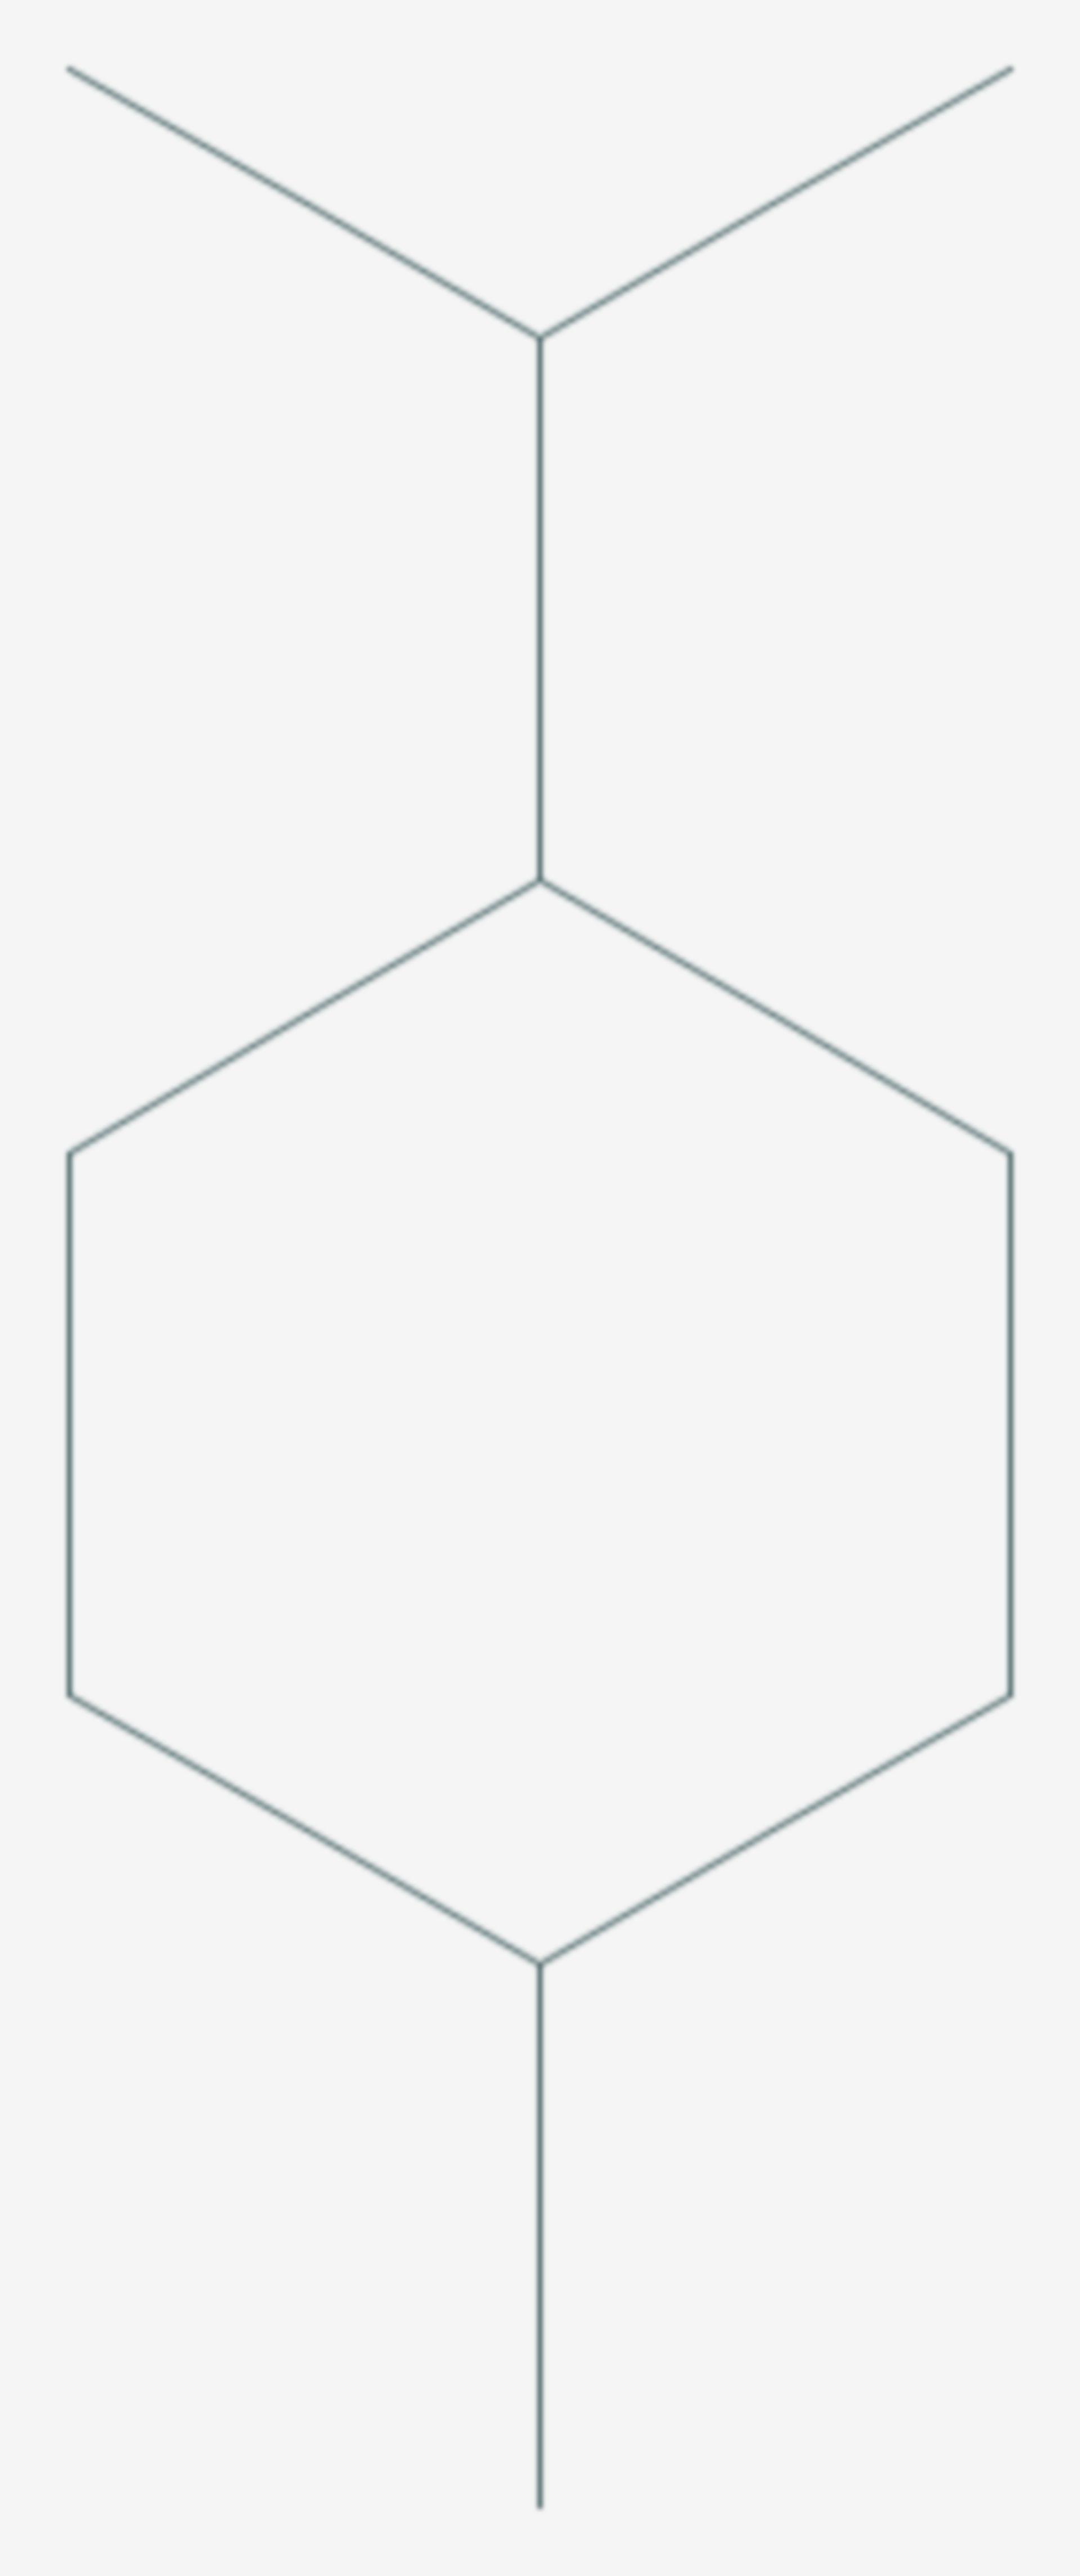 P-Menthan (Strukturformel)